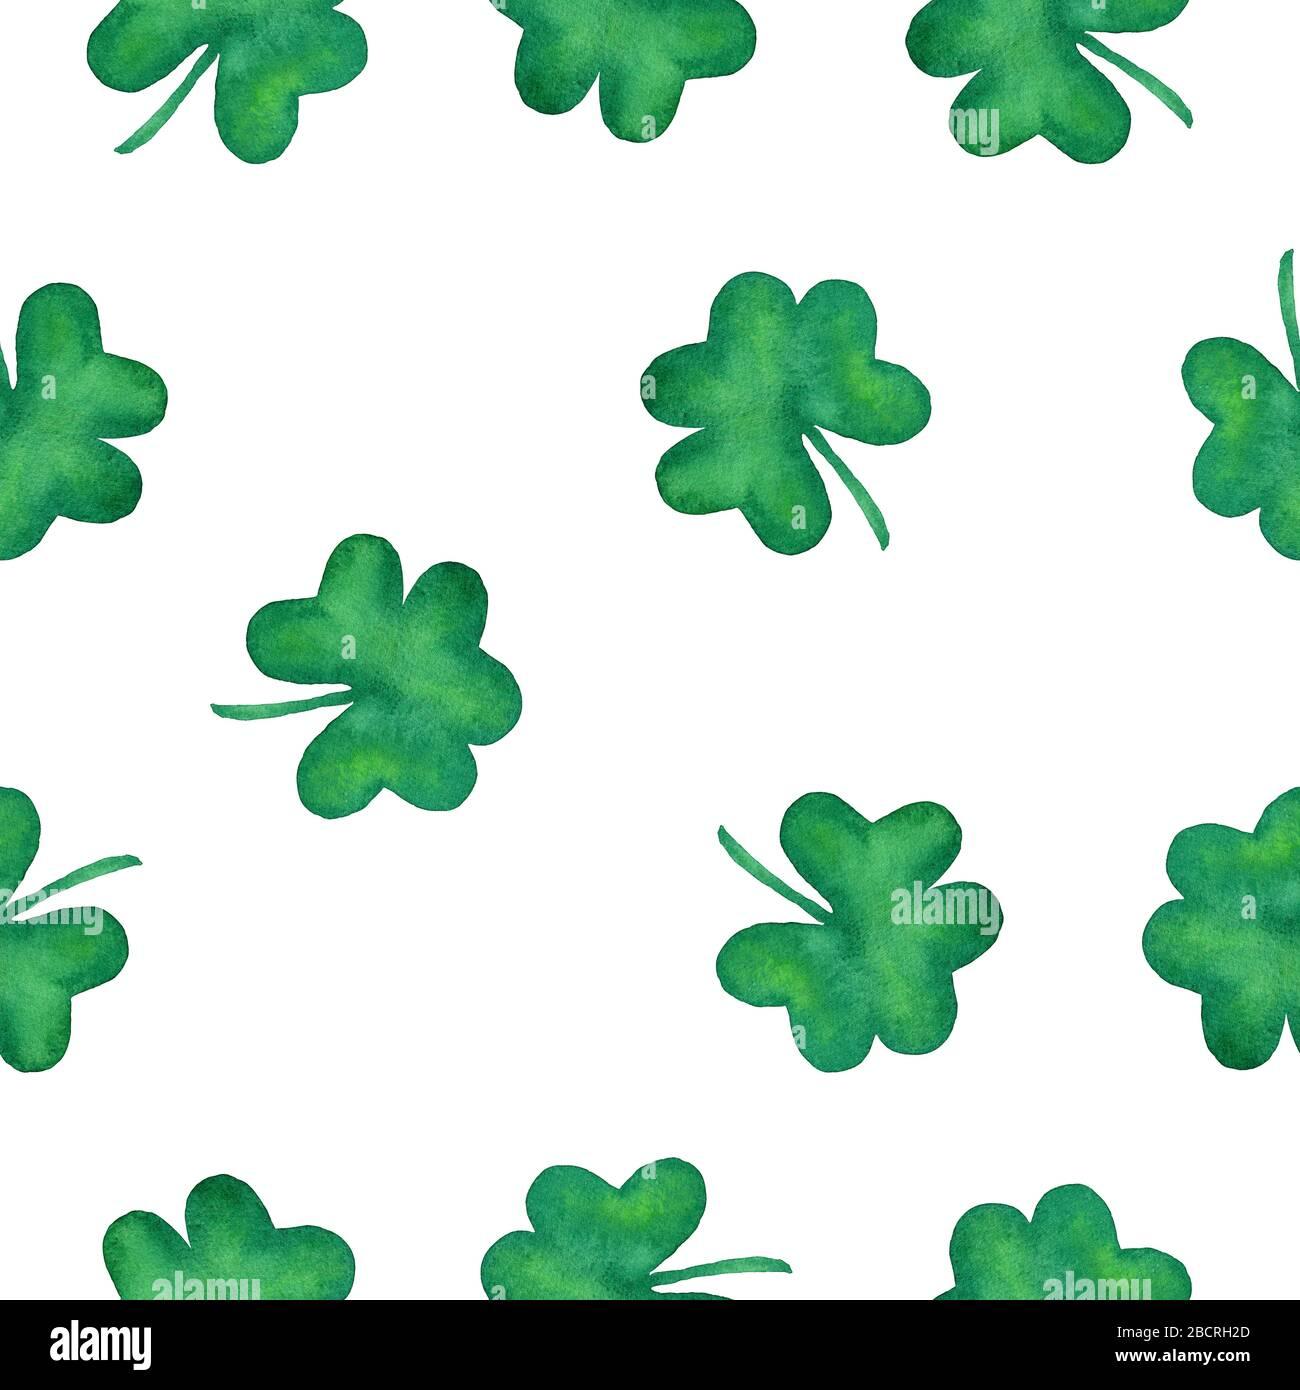 Made To Order St Patrick/'s Day St Paddy/'s Irish Watercolor Shamrocks Fabric By The Yard Shamrocks